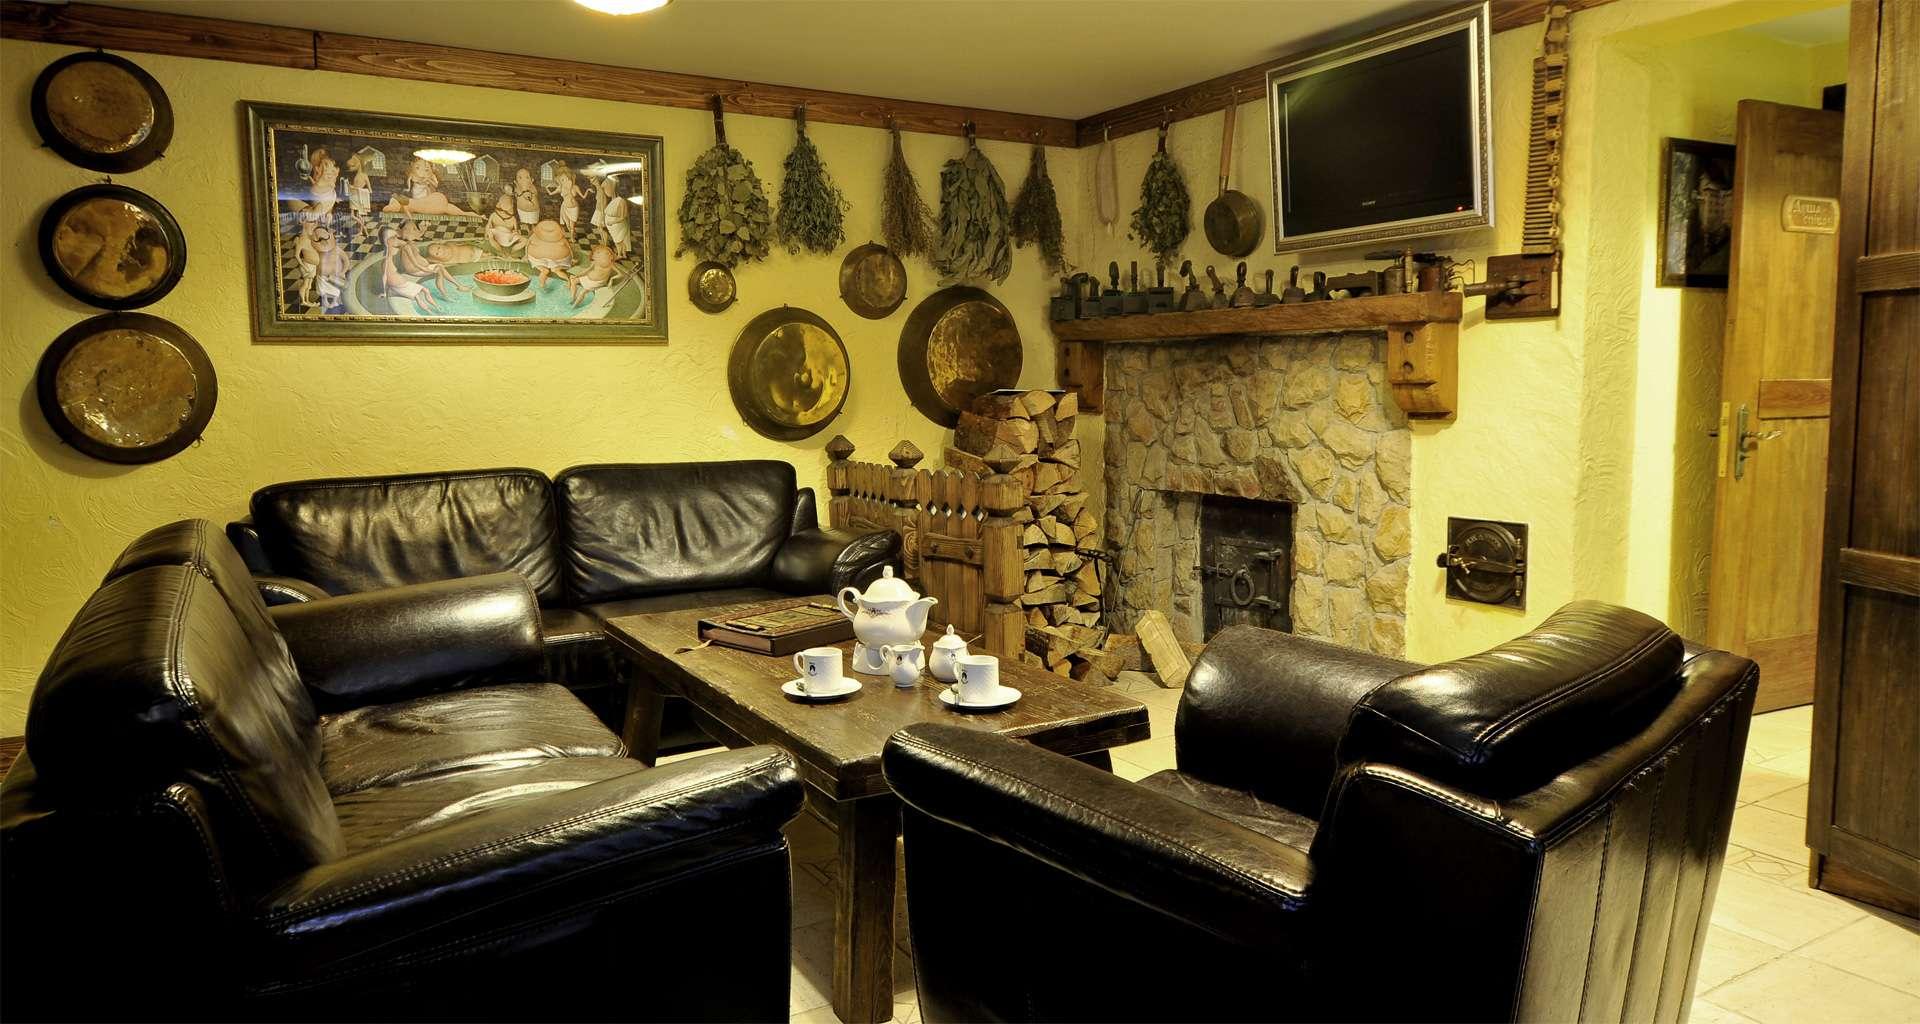 Rest room in Russian bath in the Carpathians